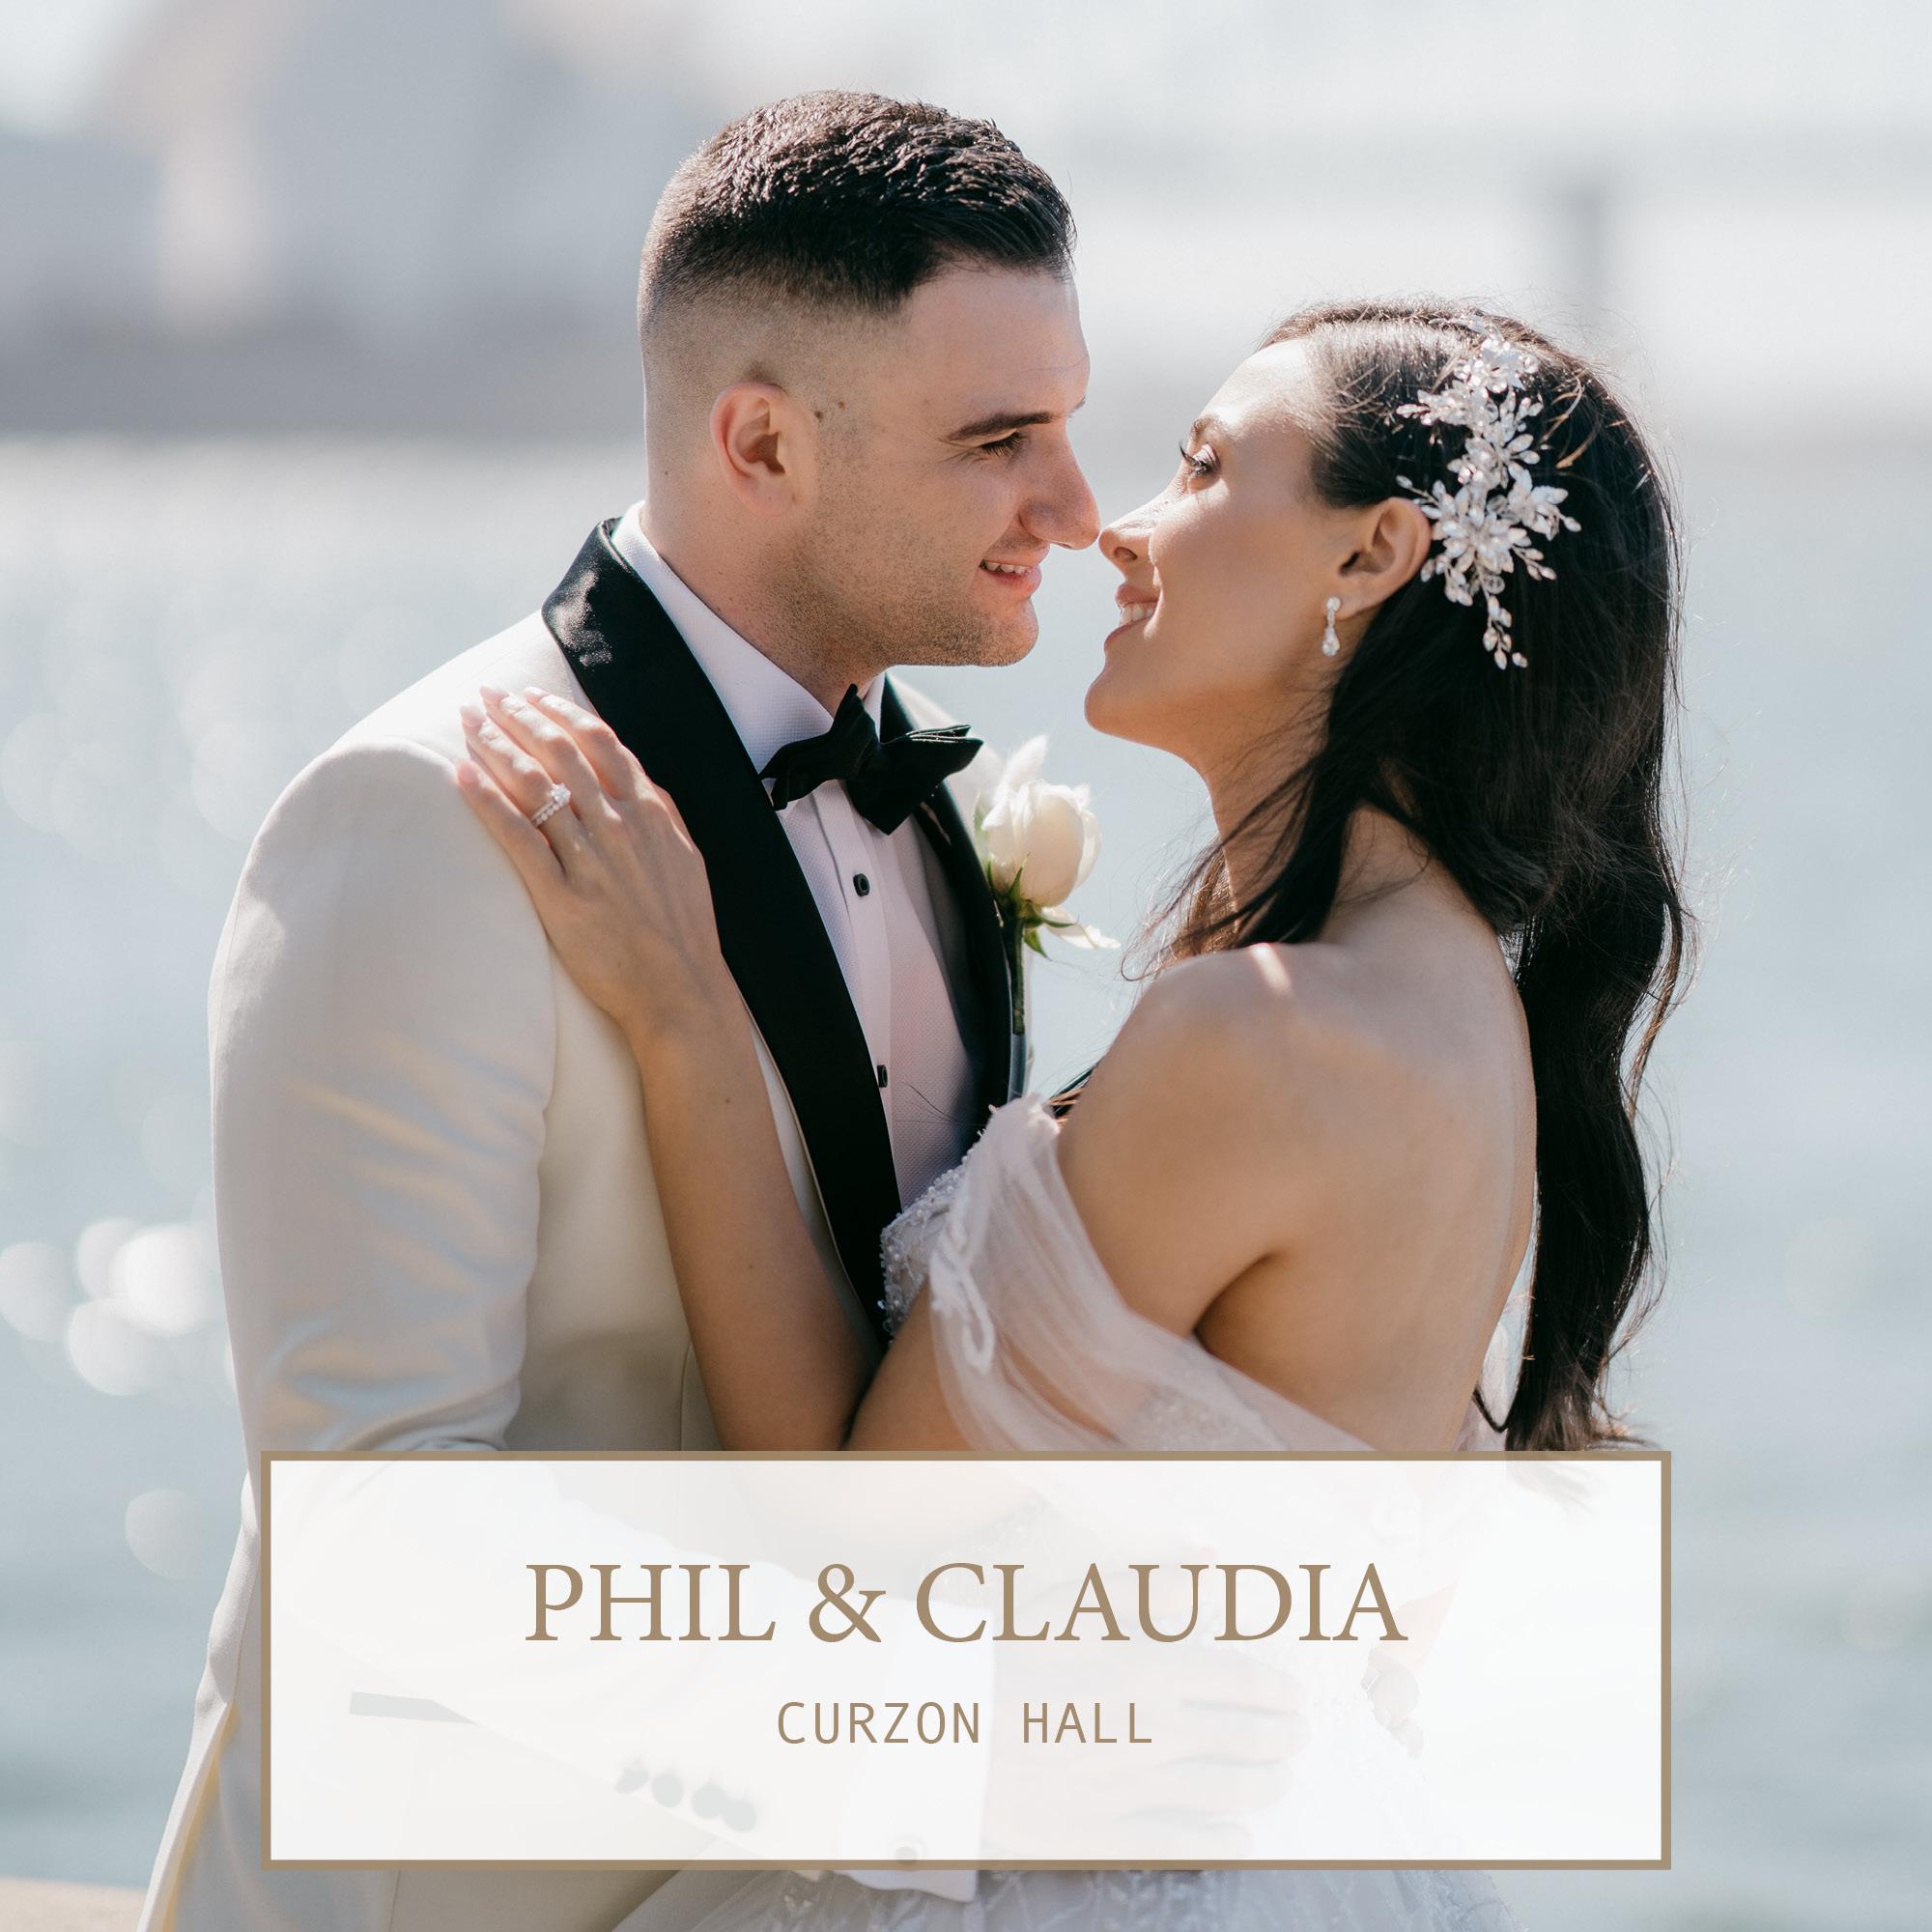 Curzon Hall Wedding: Phil & Claudia 1